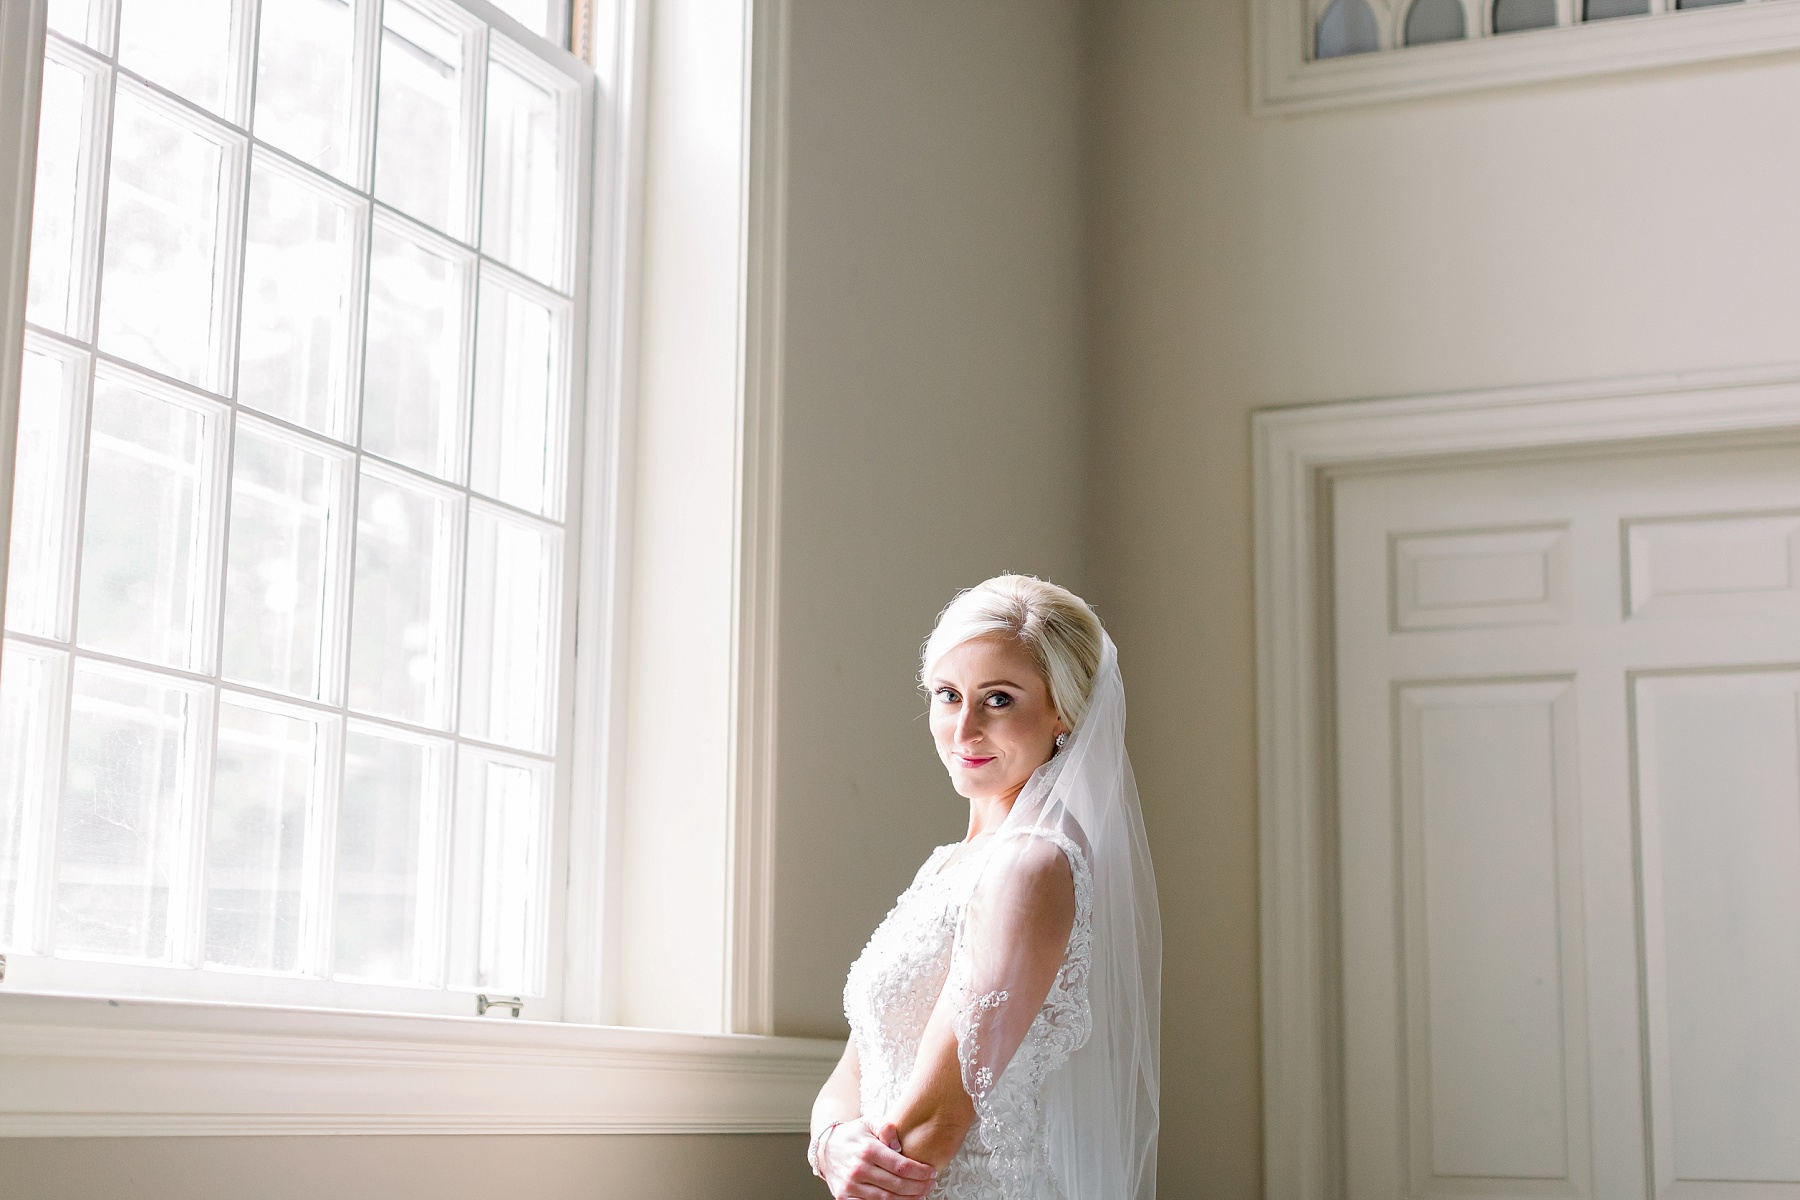 midwest-adventurous-wedding-photographer-elizabeth-ladean-photography-photo_4722.jpg